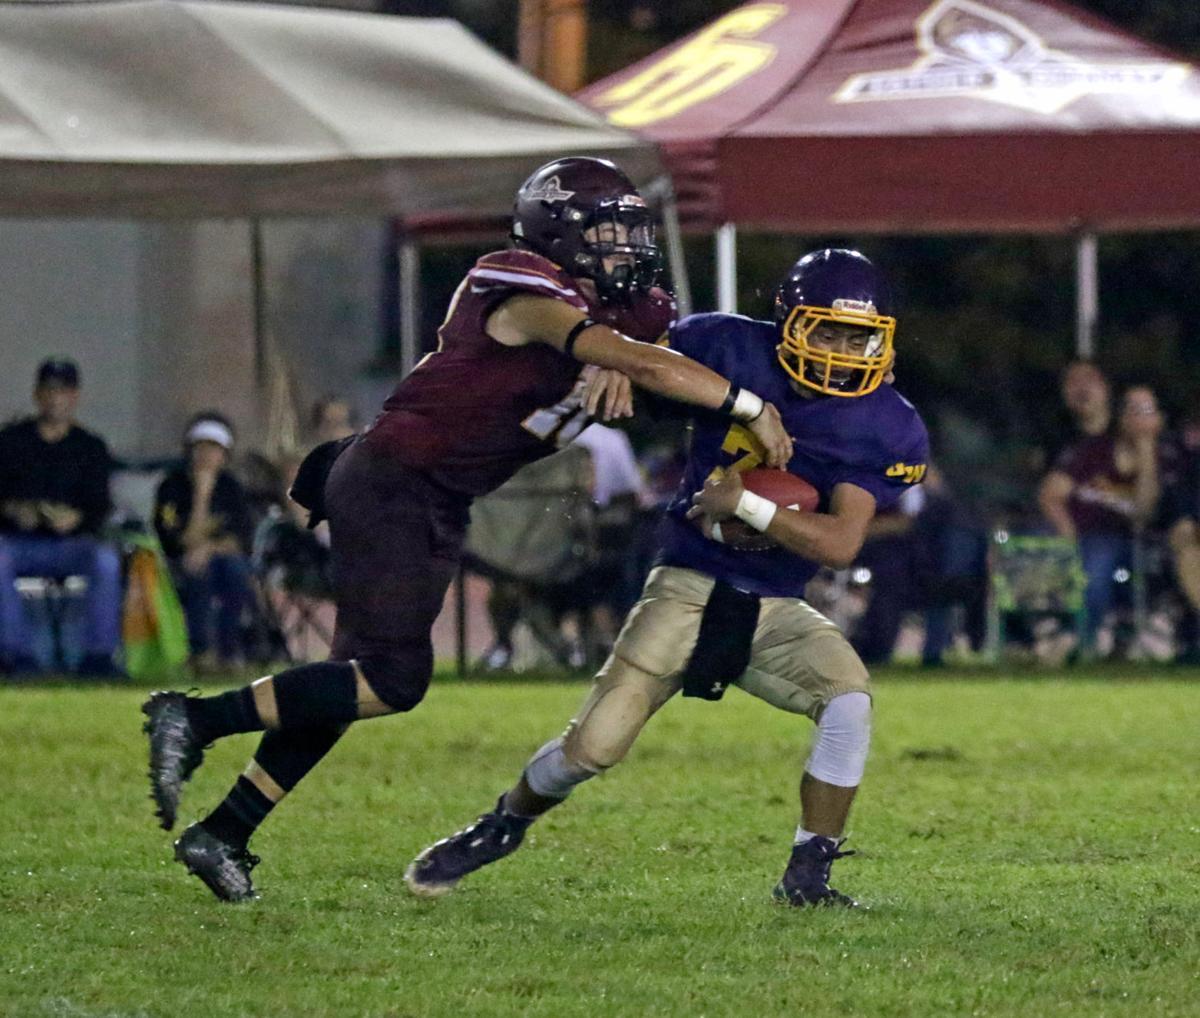 Governor: No interscholastic sports yet